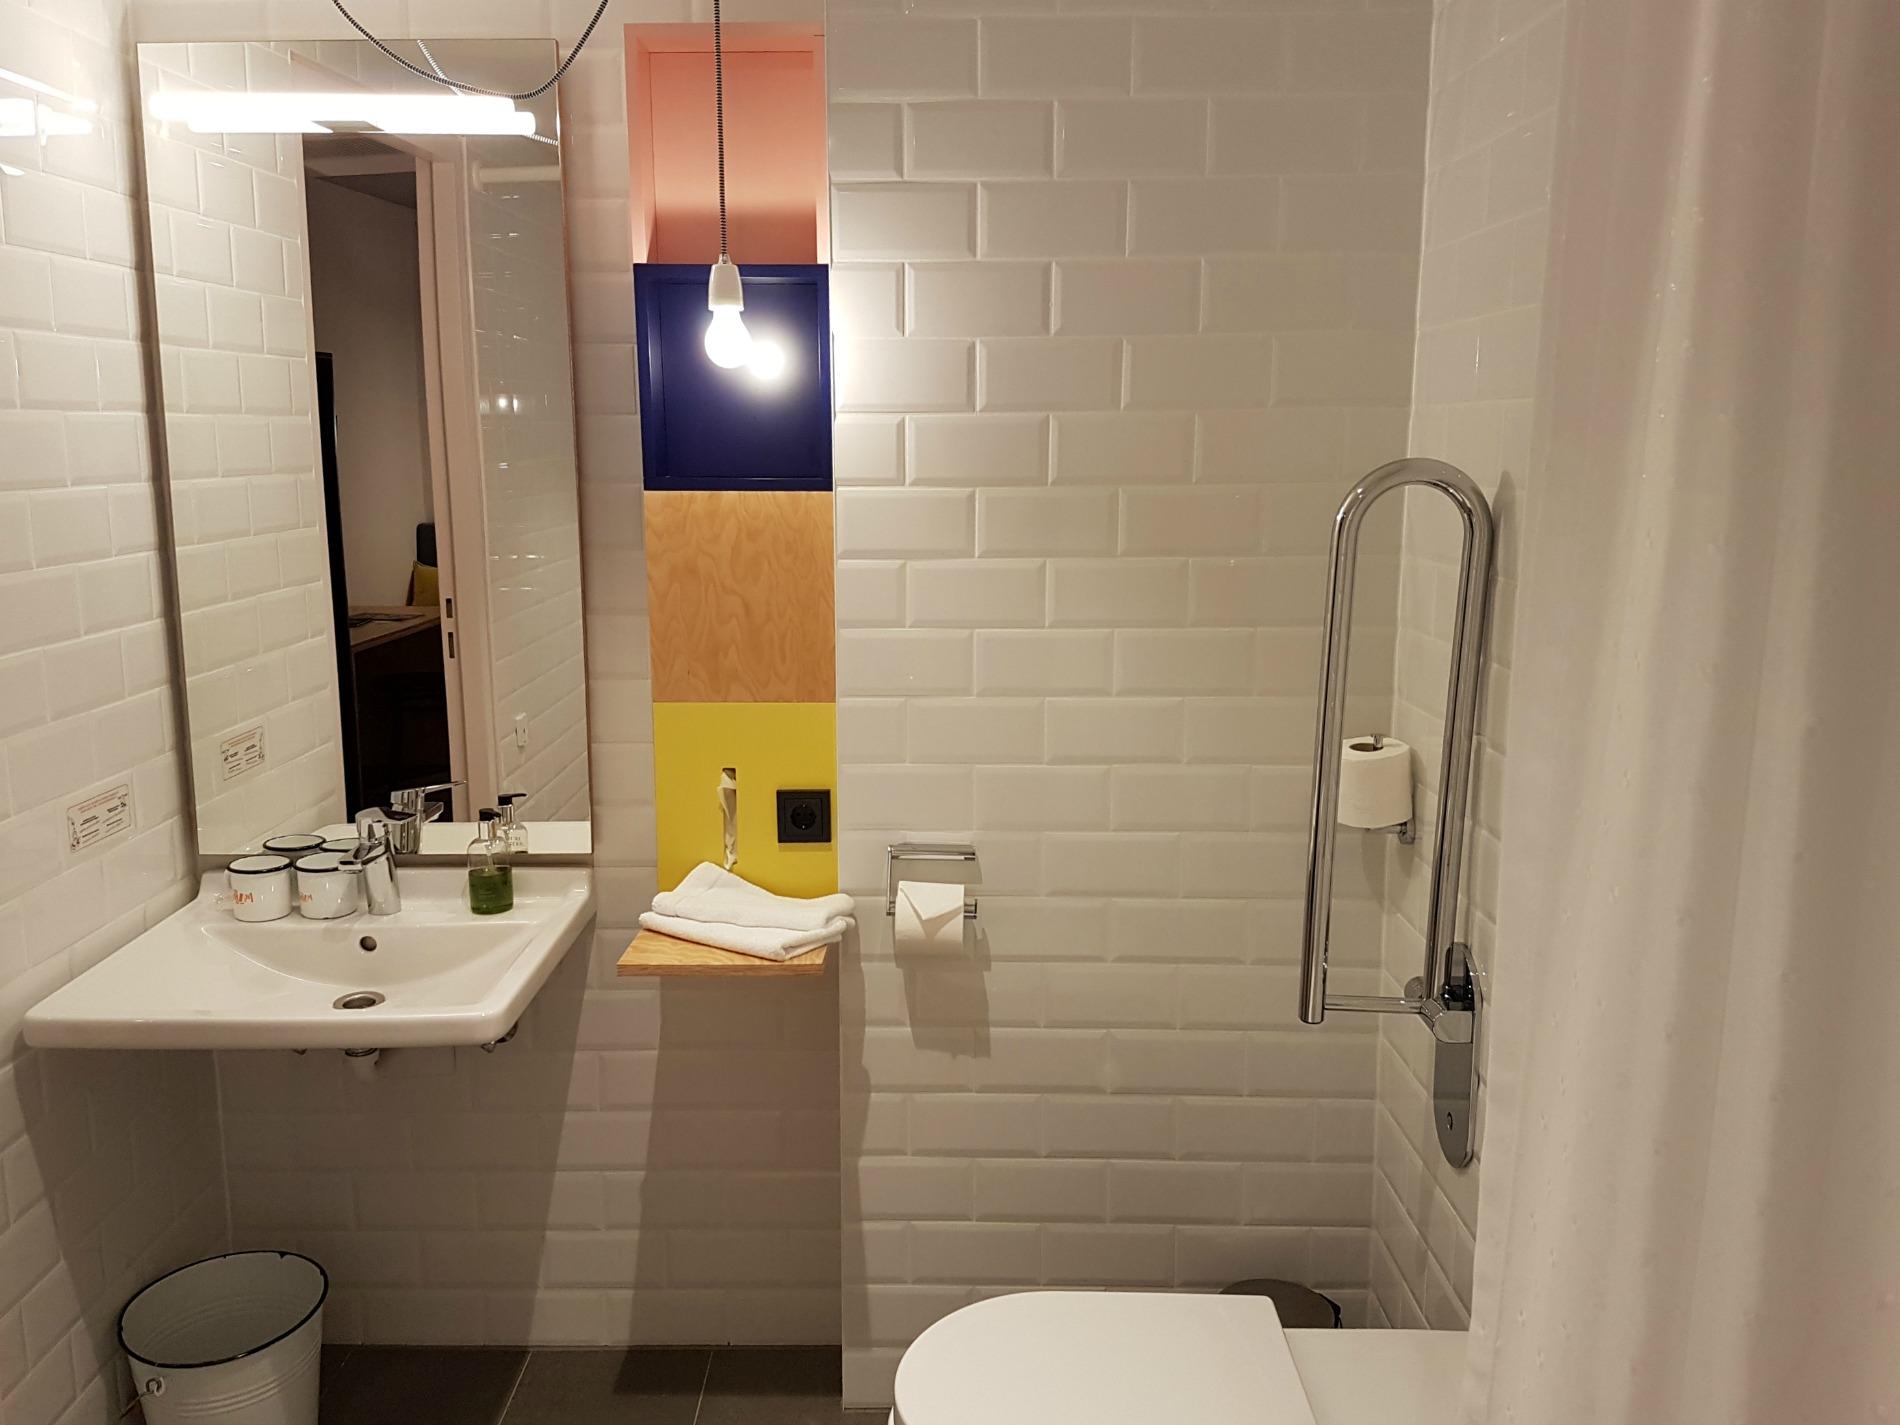 hotel-schani-wien-bathroom-sink